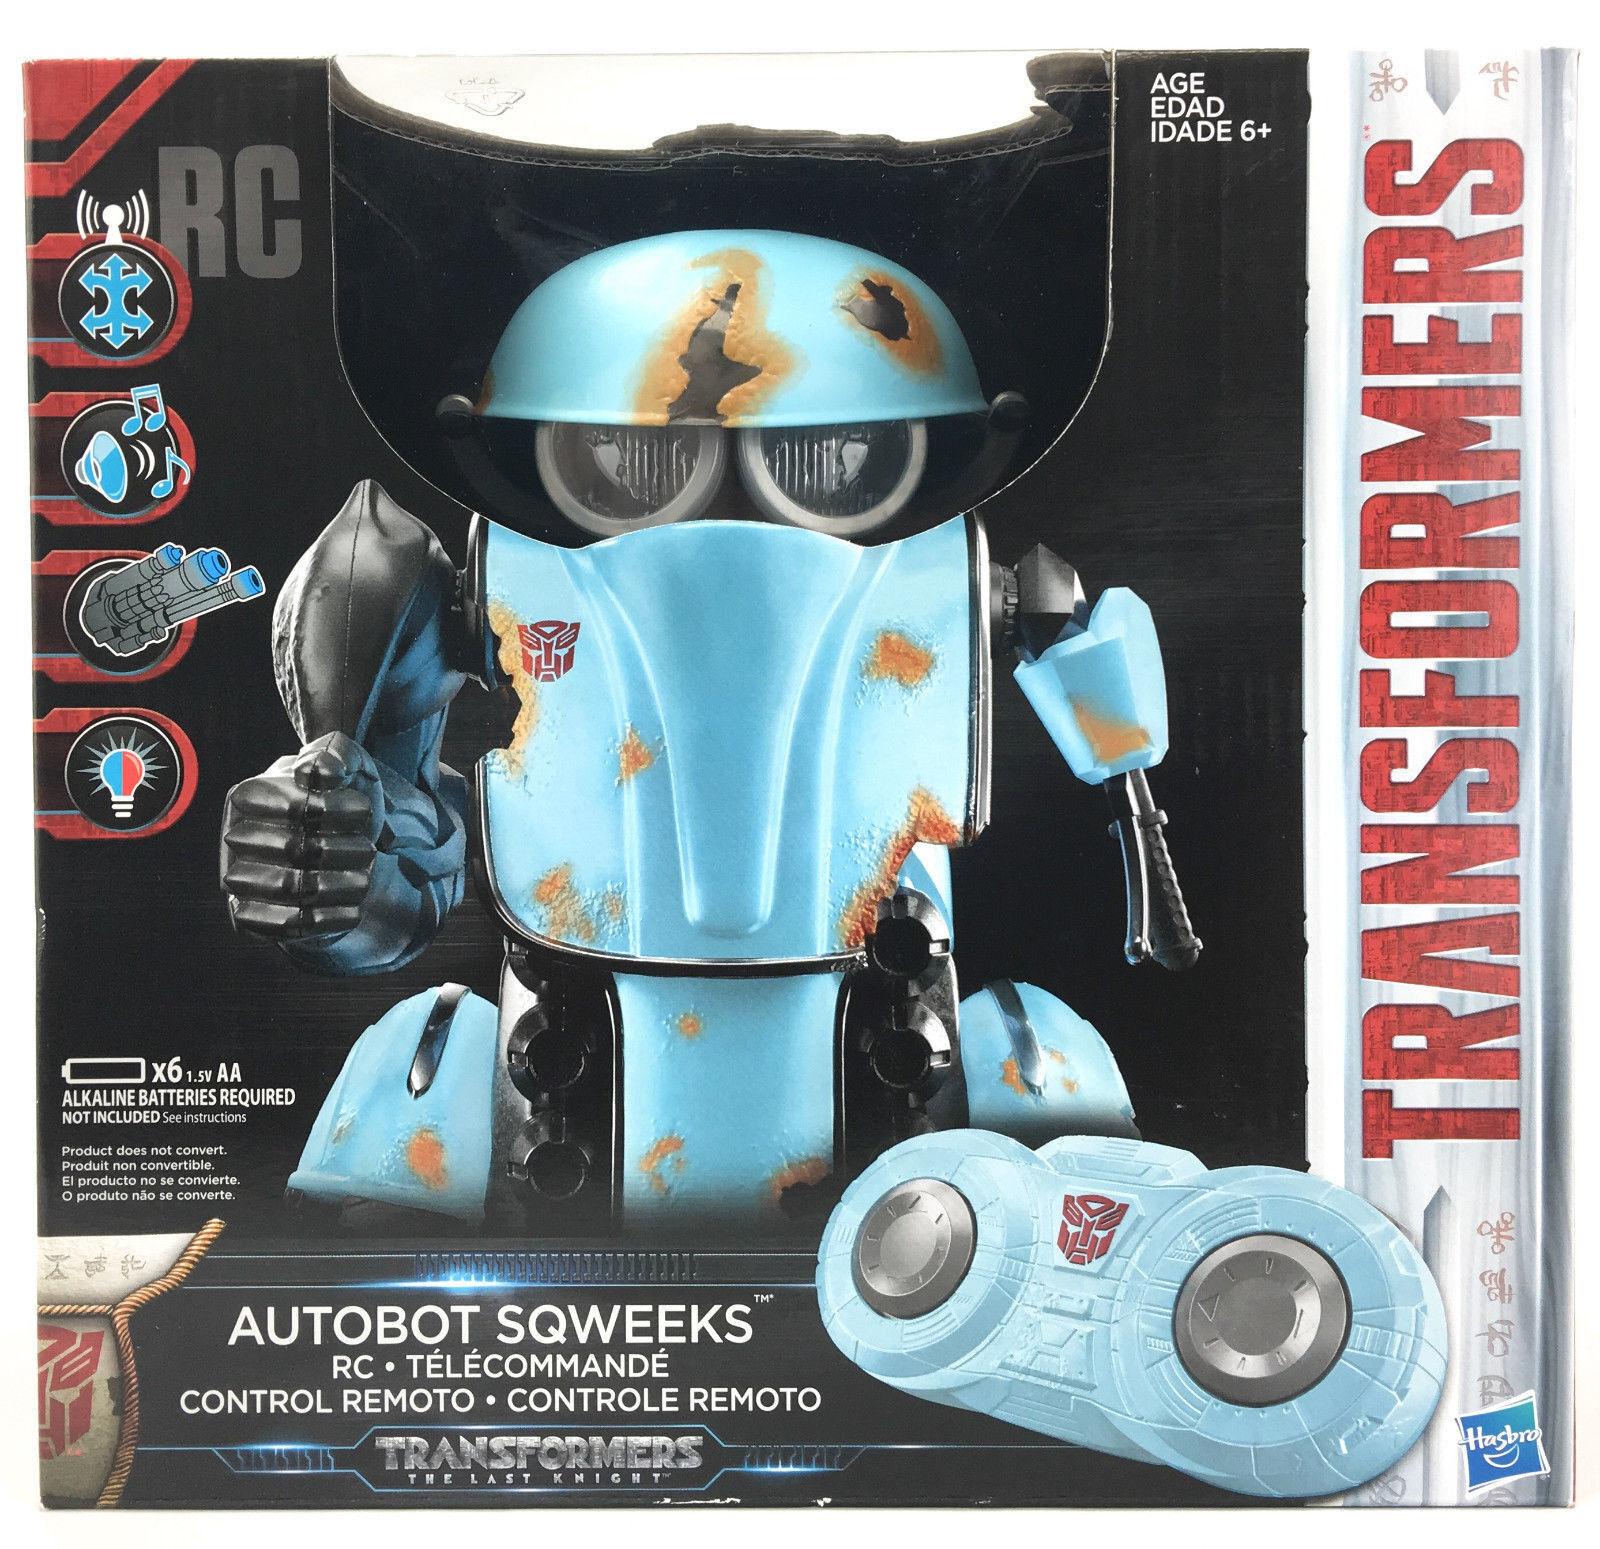 NIB Transformers The Last Knight Autobot Sqweeks Radio Control Toy by Hasbro New